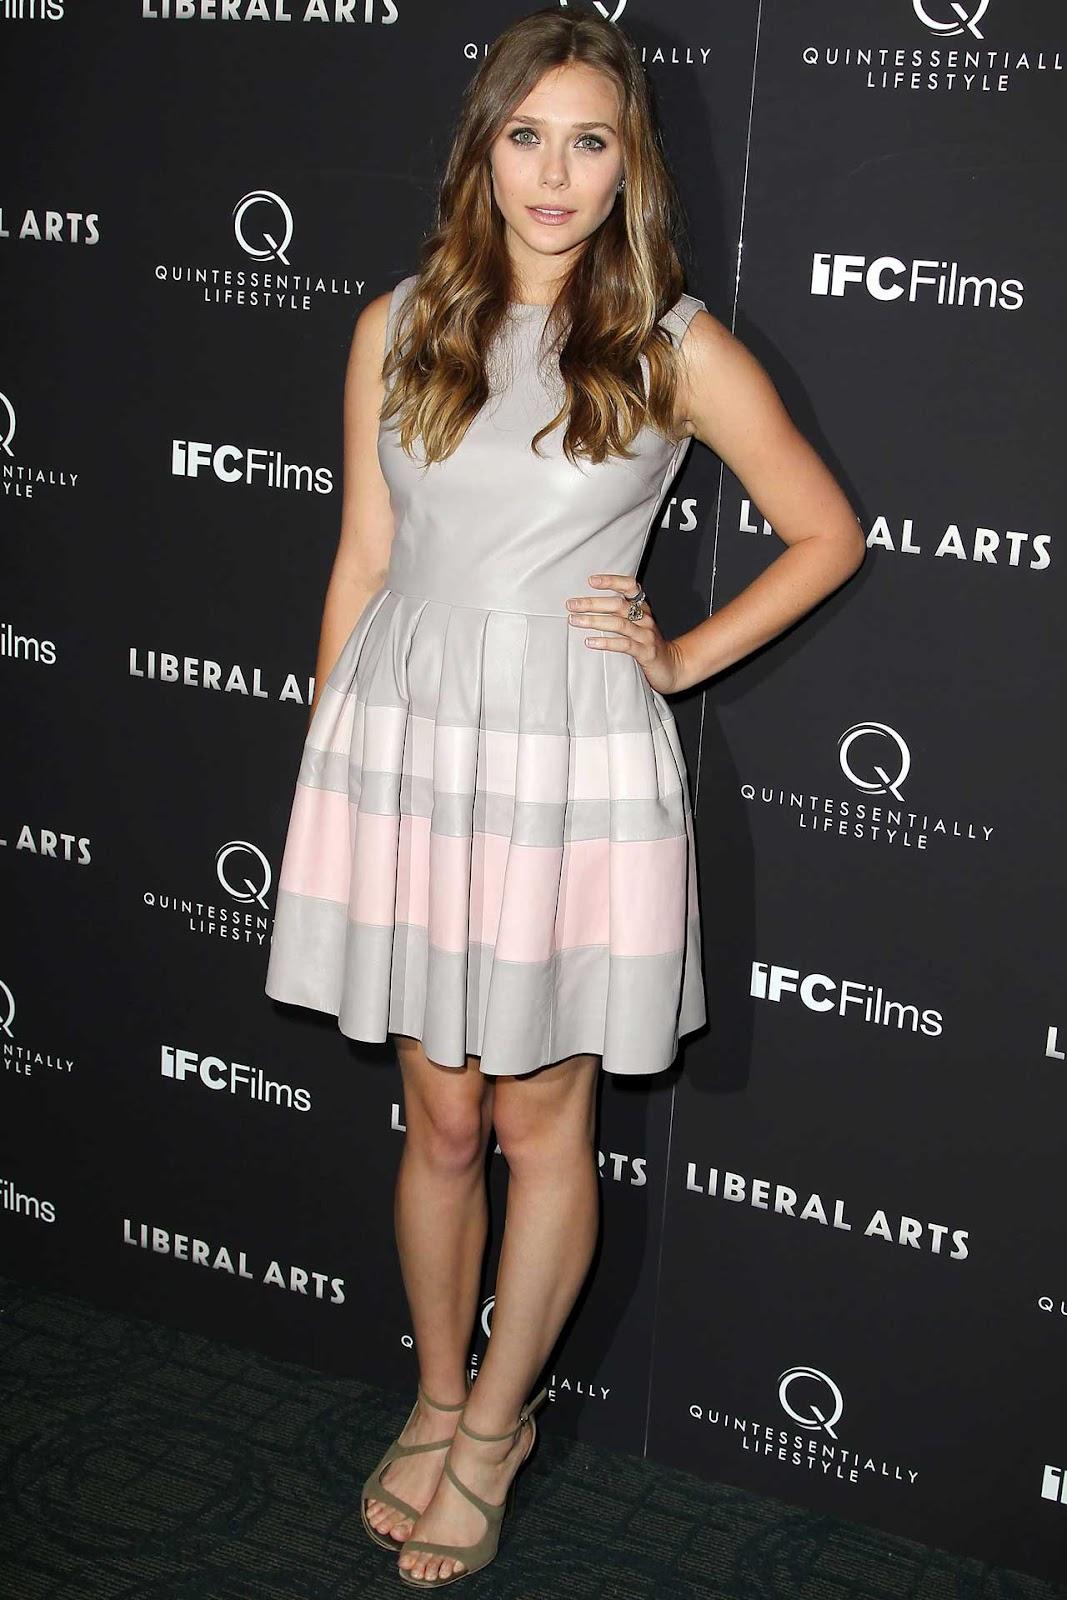 Elizabeth Olsen Wore A Christian Dior Pre Spring/summer 2013 Pale Grey